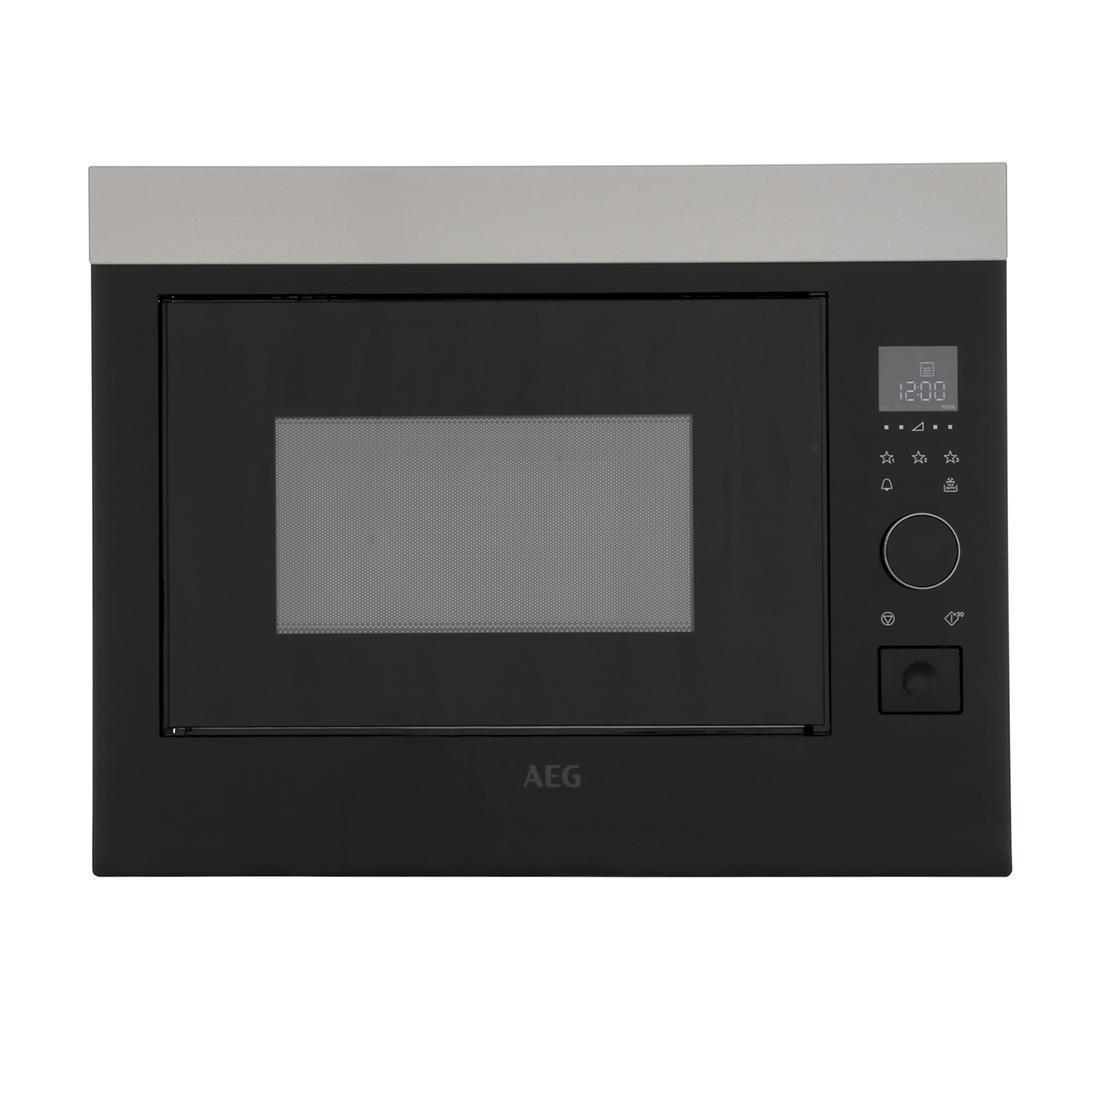 AEG MBE2658S-M Built In Microwave